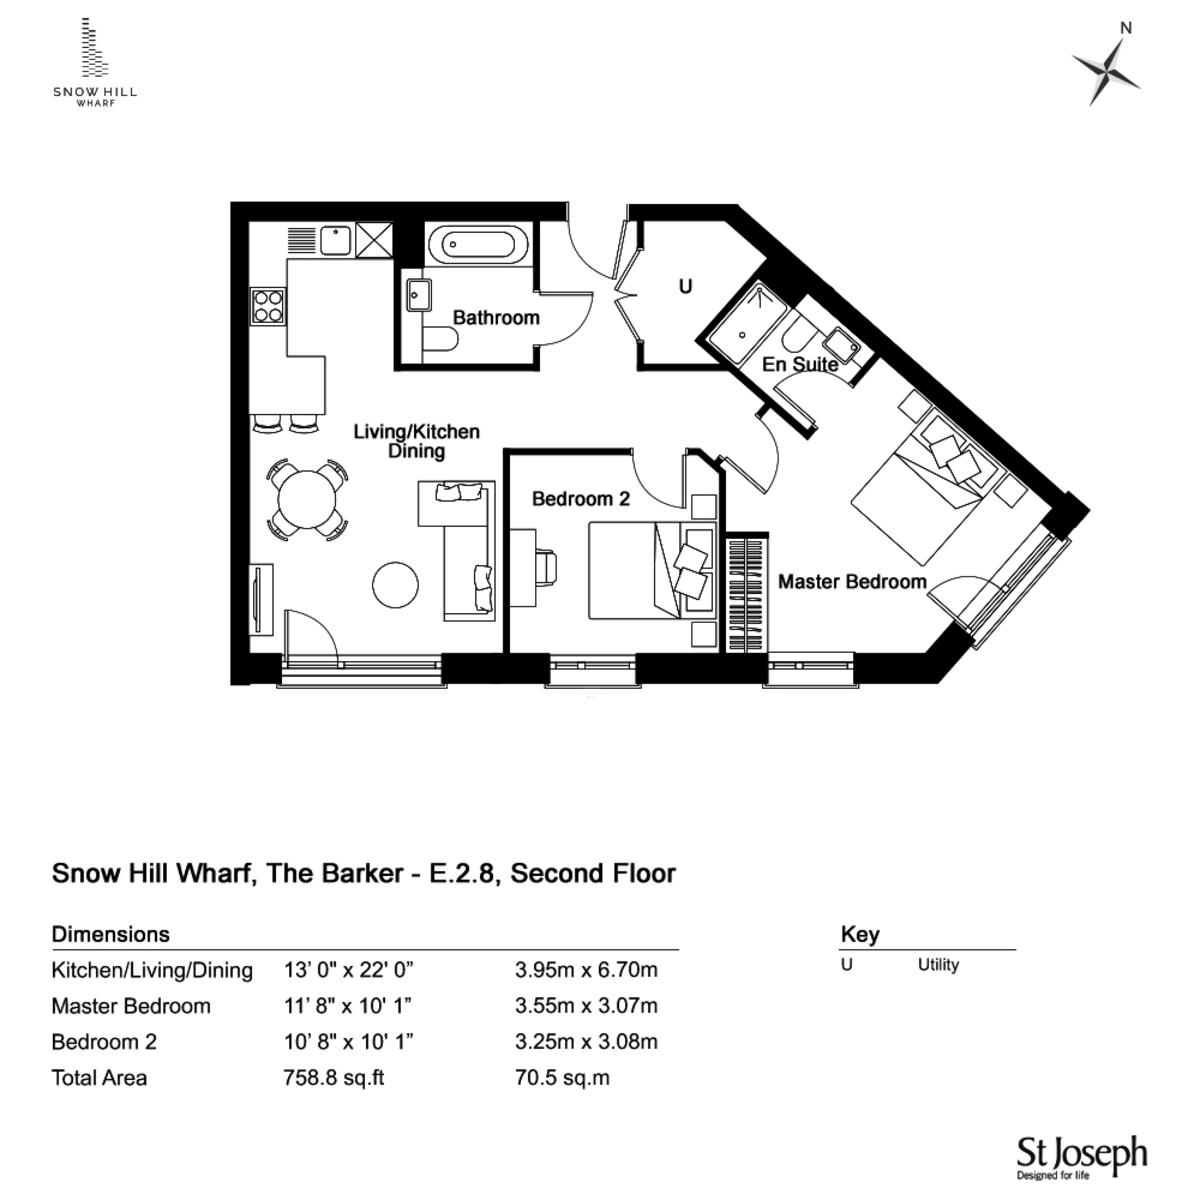 The Barker, Snow Hill Wharf, Birmingham City Centre floorplan 1 of 2